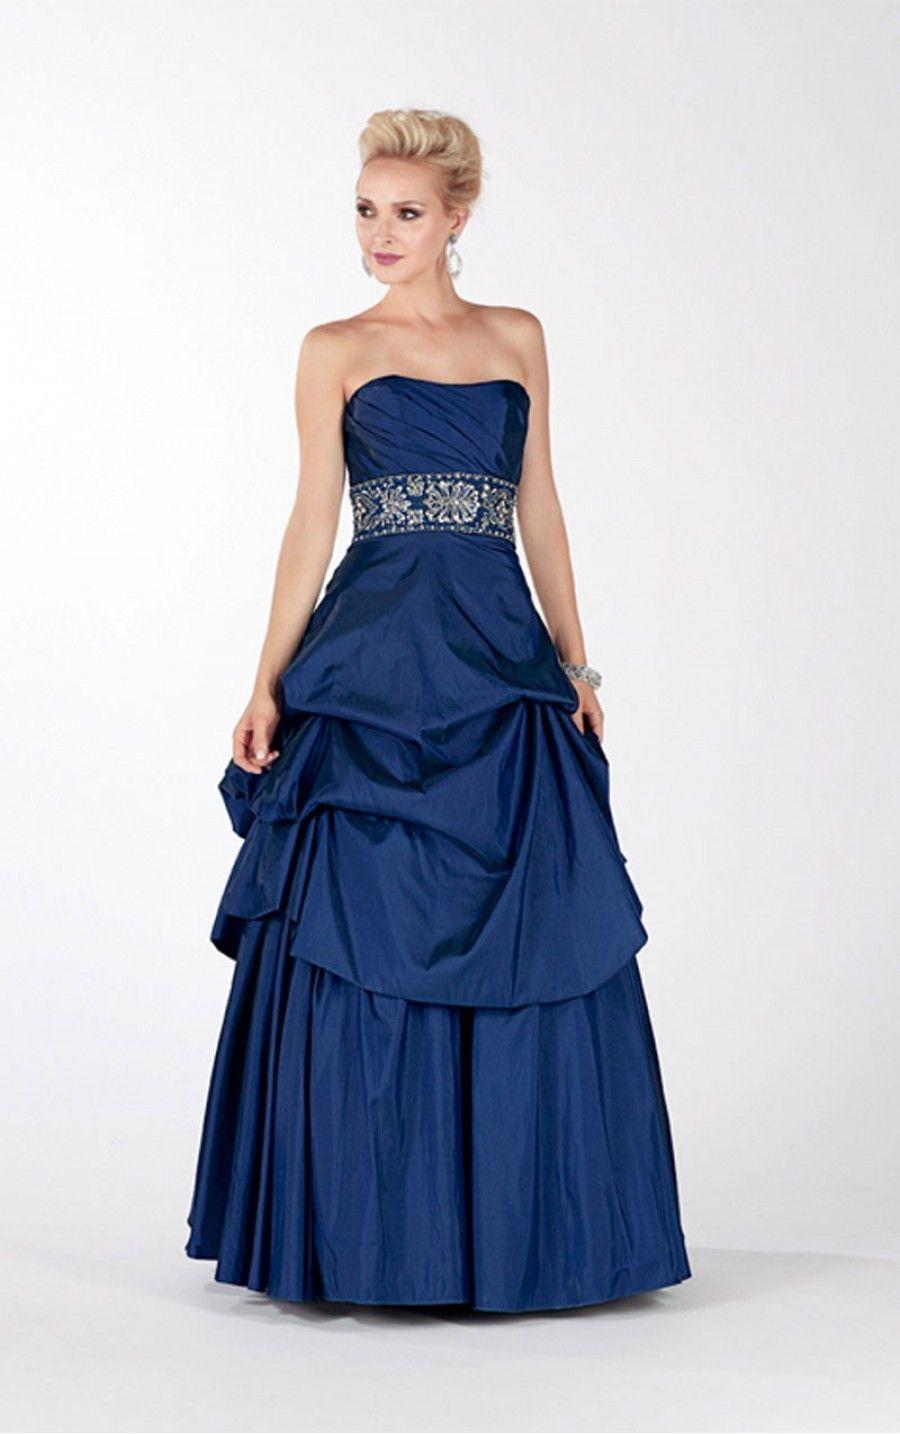 Charming A-line Floor-length Sweetheart Taffeta Dress